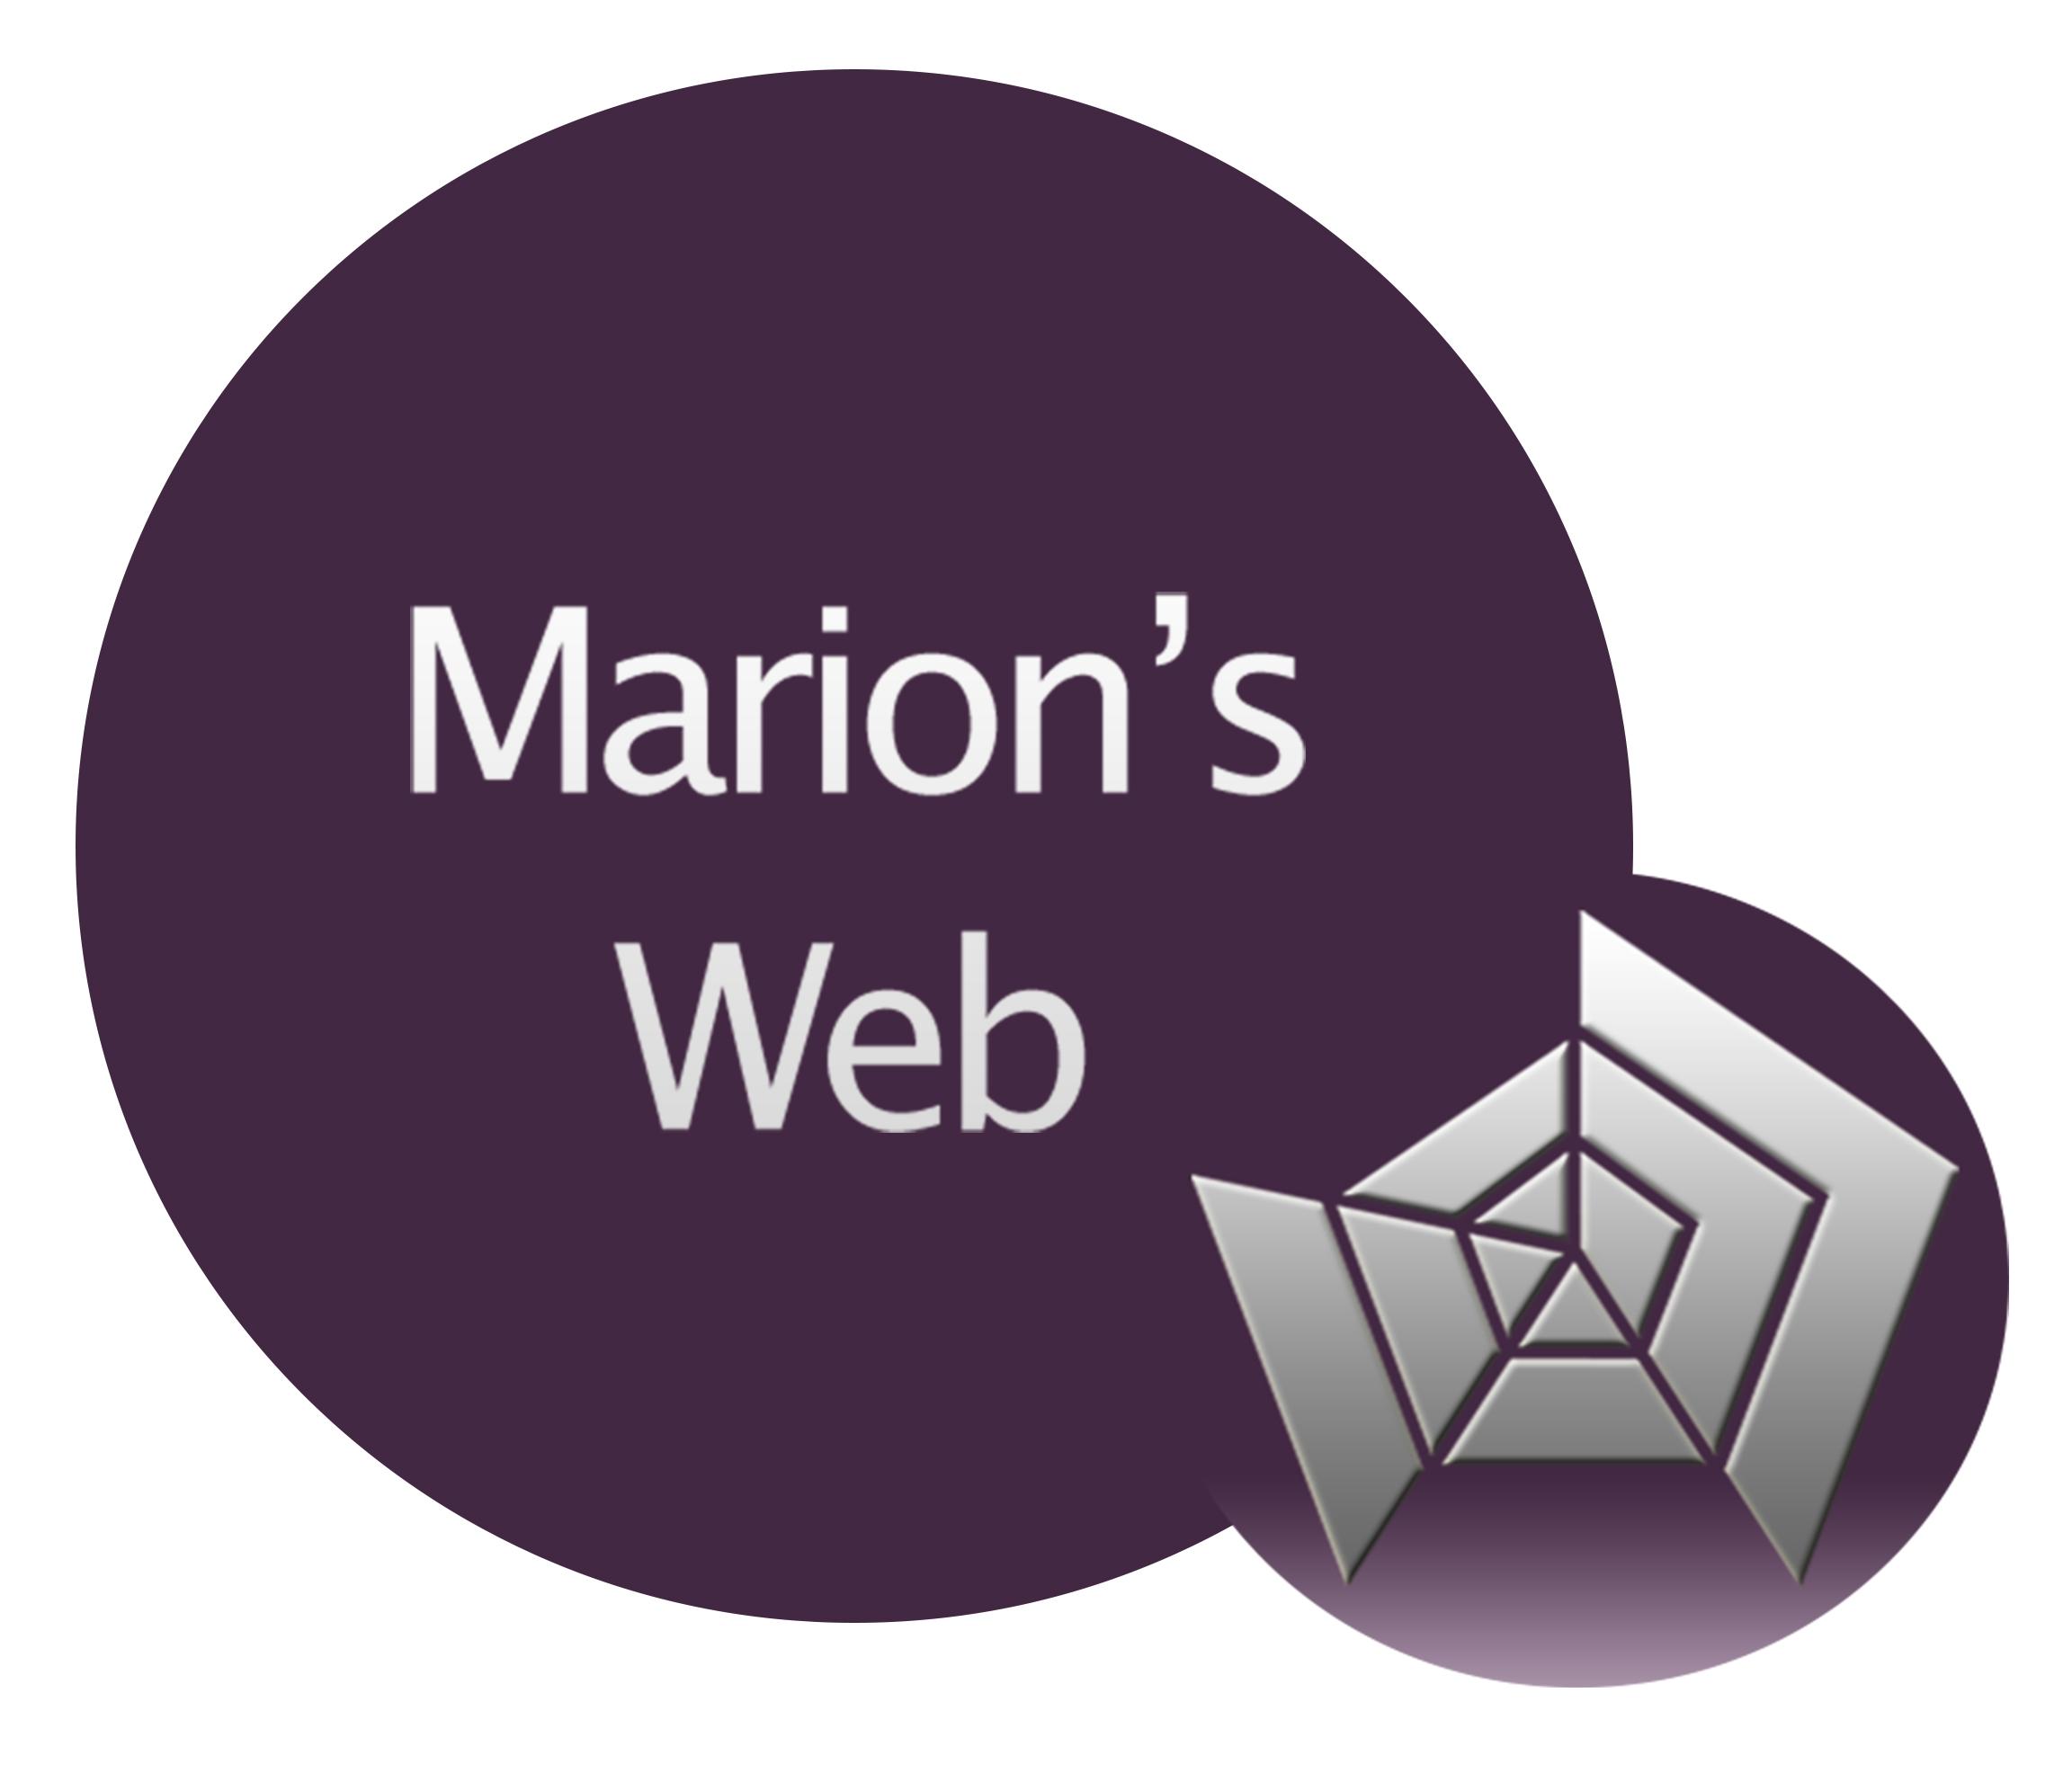 Marions Web